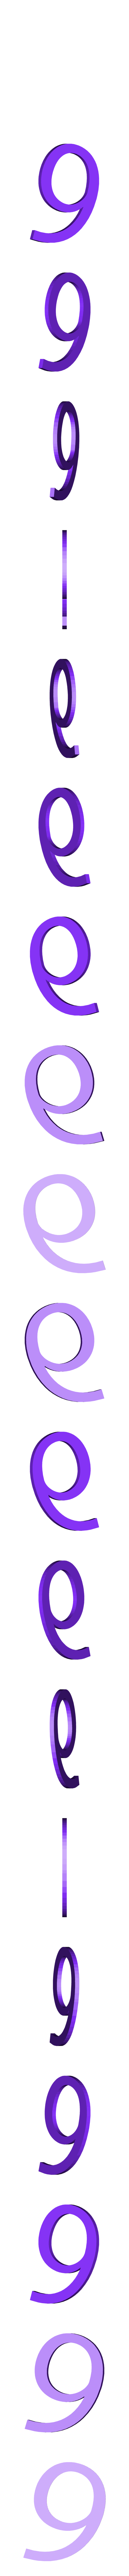 logo_100_6.stl Download free STL file iPhone6 case • Design to 3D print, tofuji